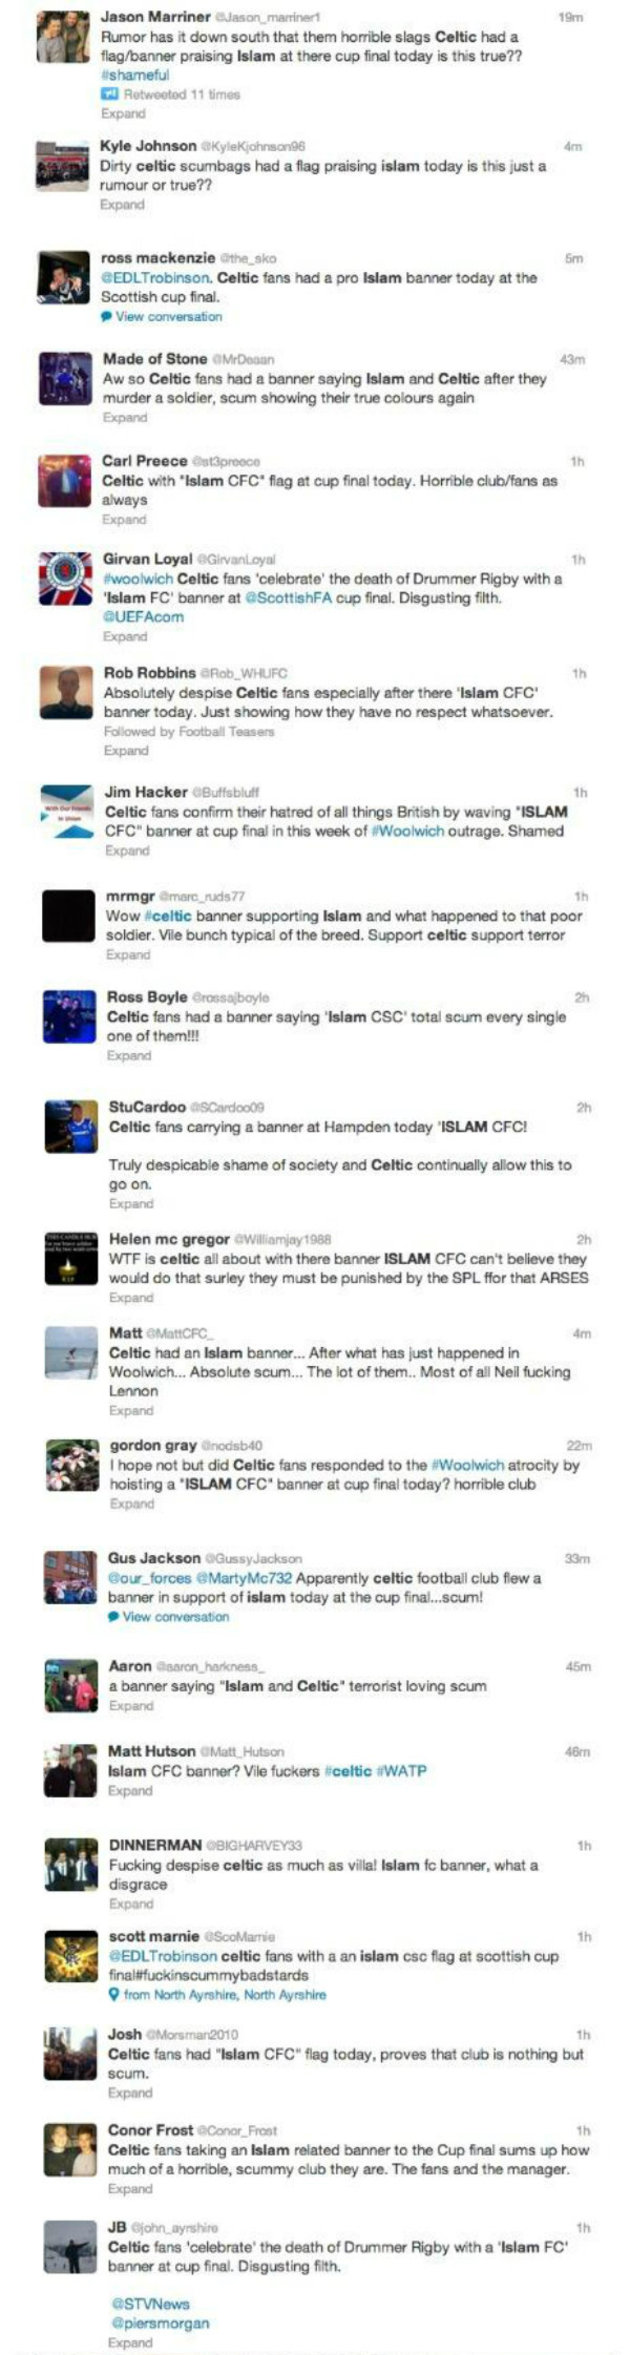 Scottish cup final 'Islam banner' tweets